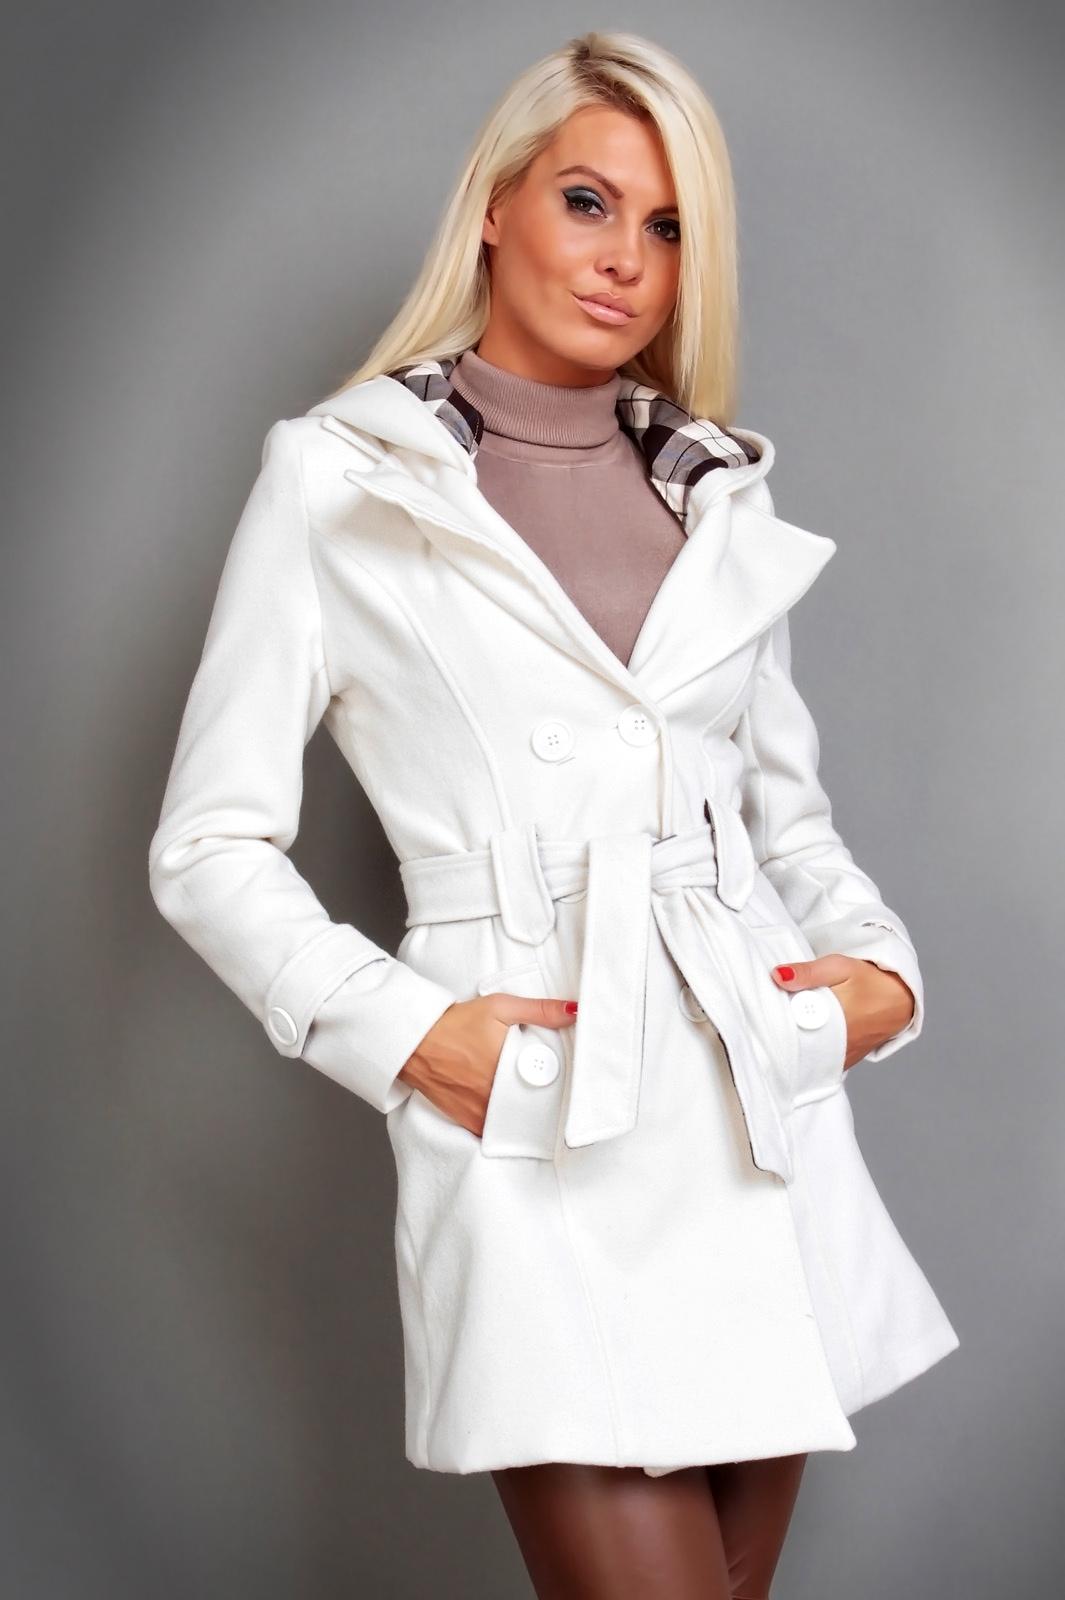 damen winter jacke mantel wolljacke mit kapuze 5 farben ebay. Black Bedroom Furniture Sets. Home Design Ideas